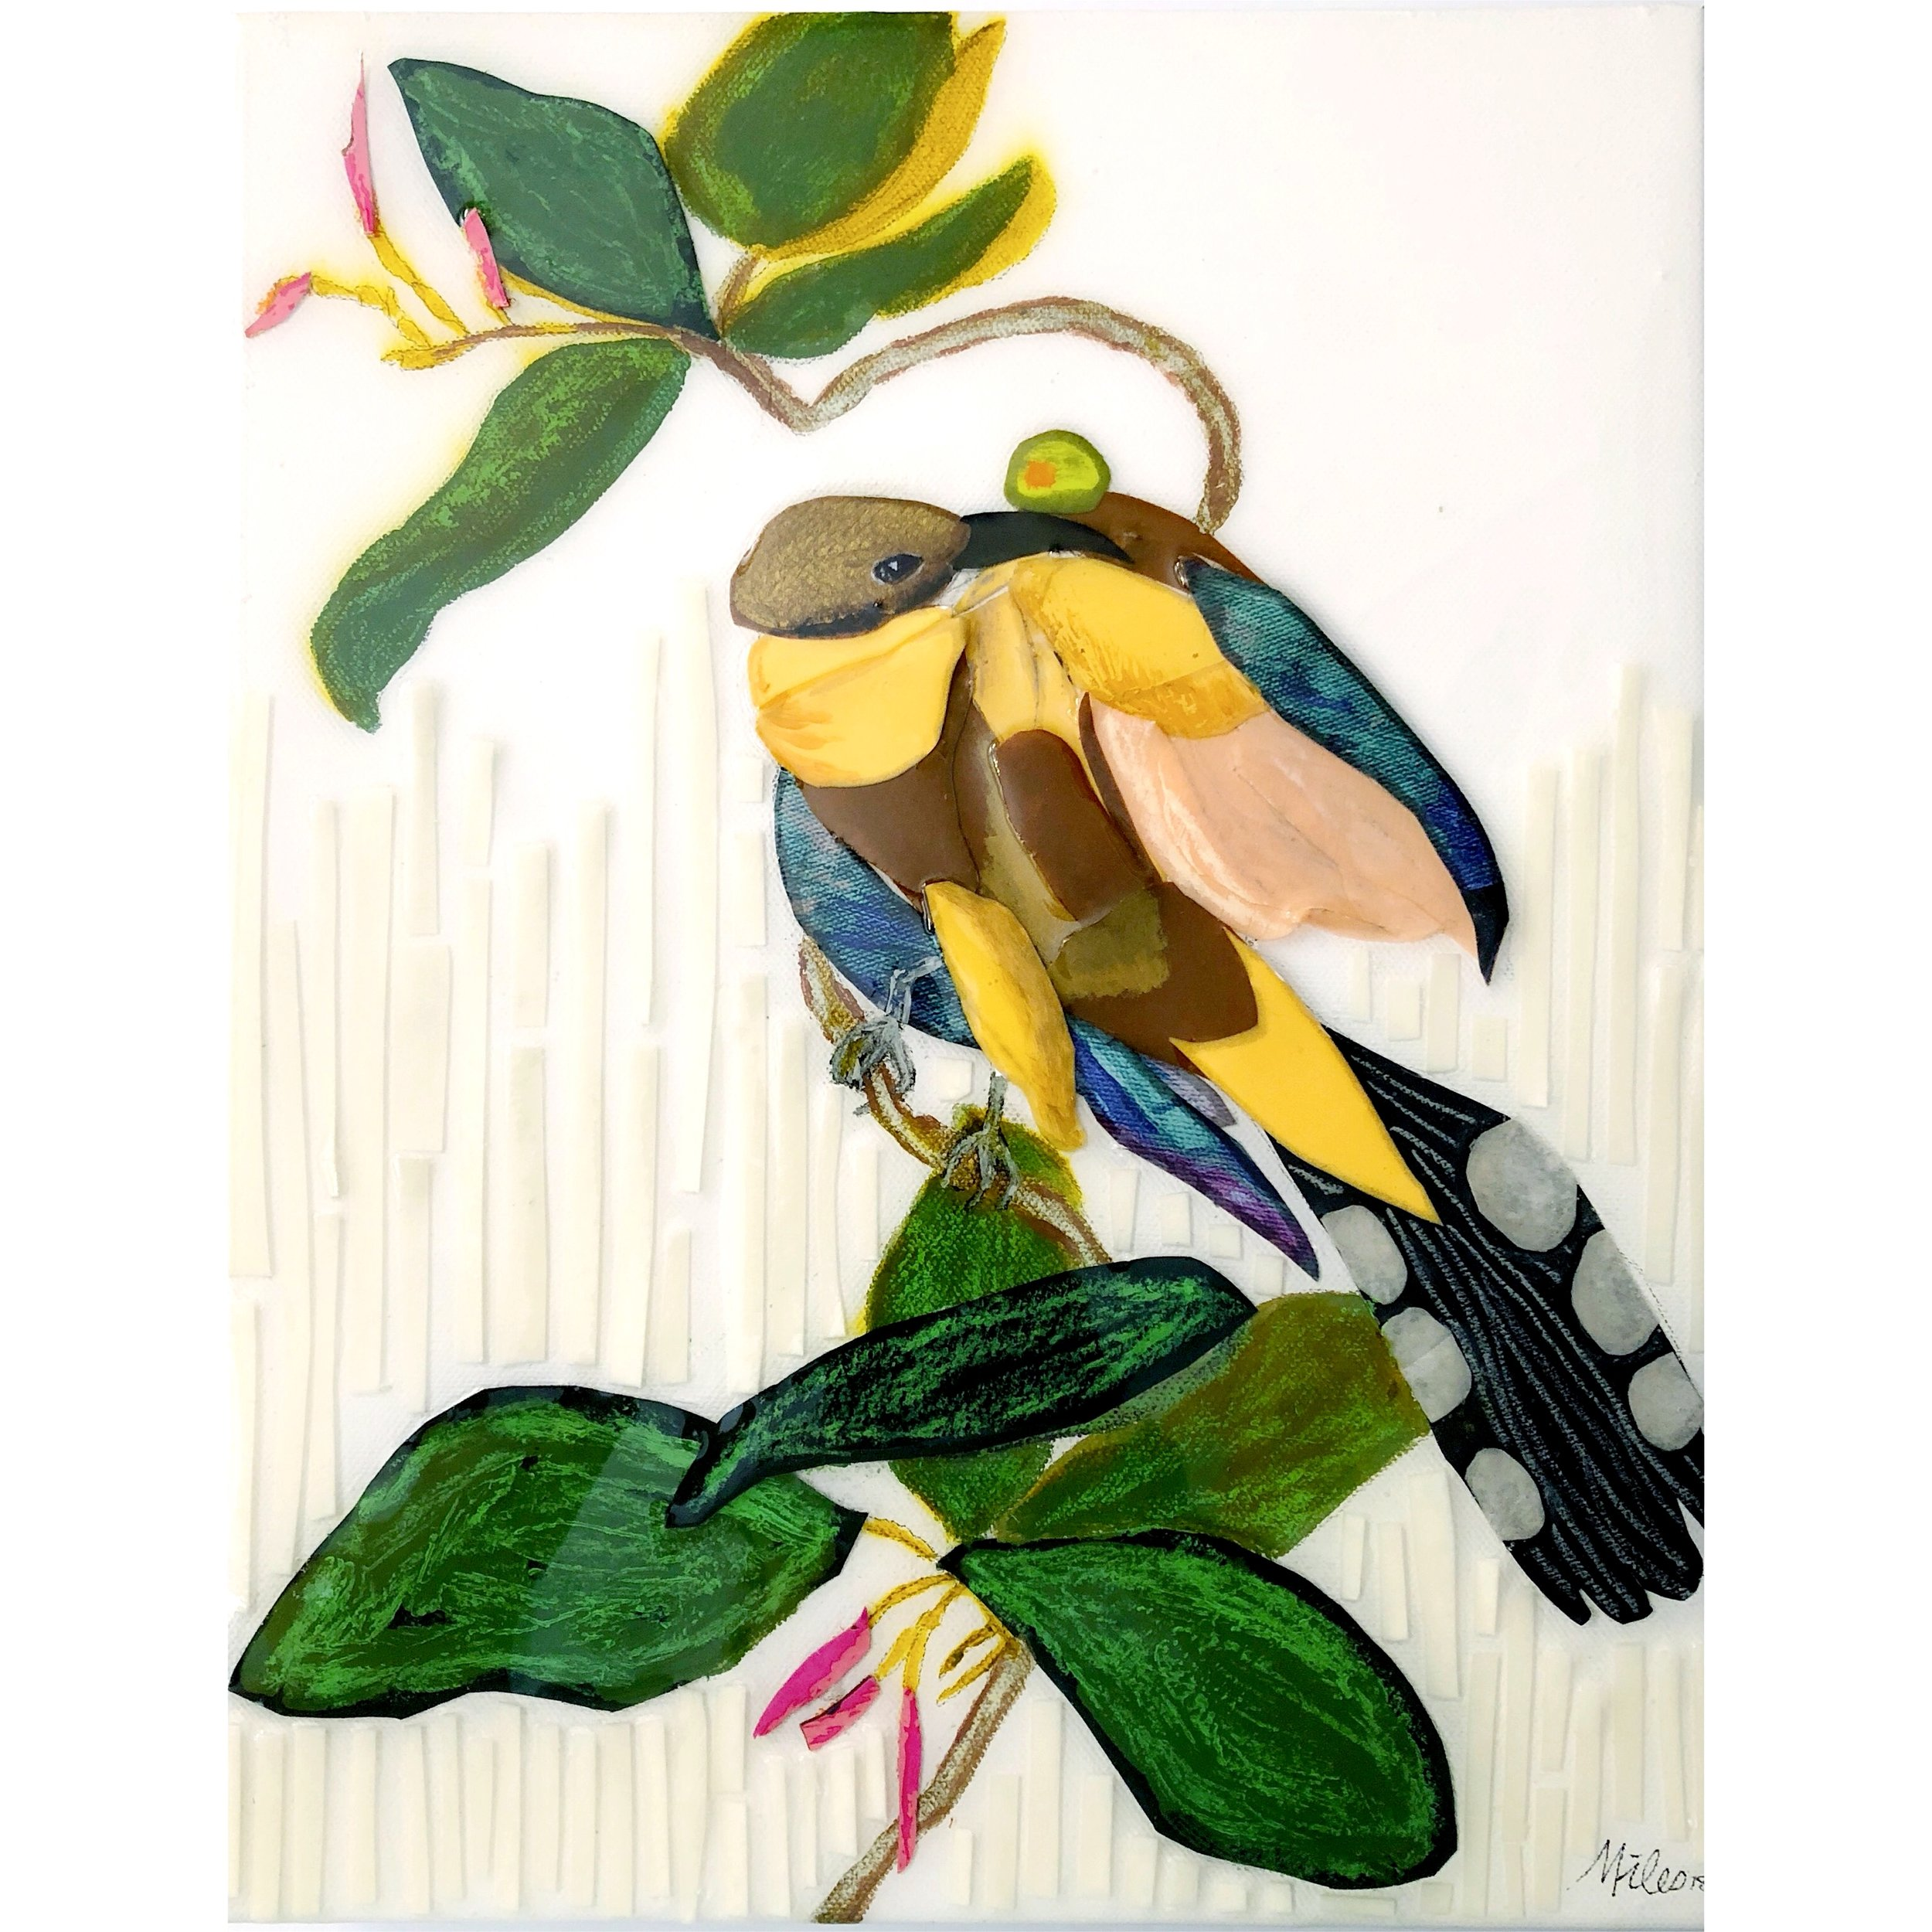 Martini Birds of America: The Mangrove Cuckoo - 11